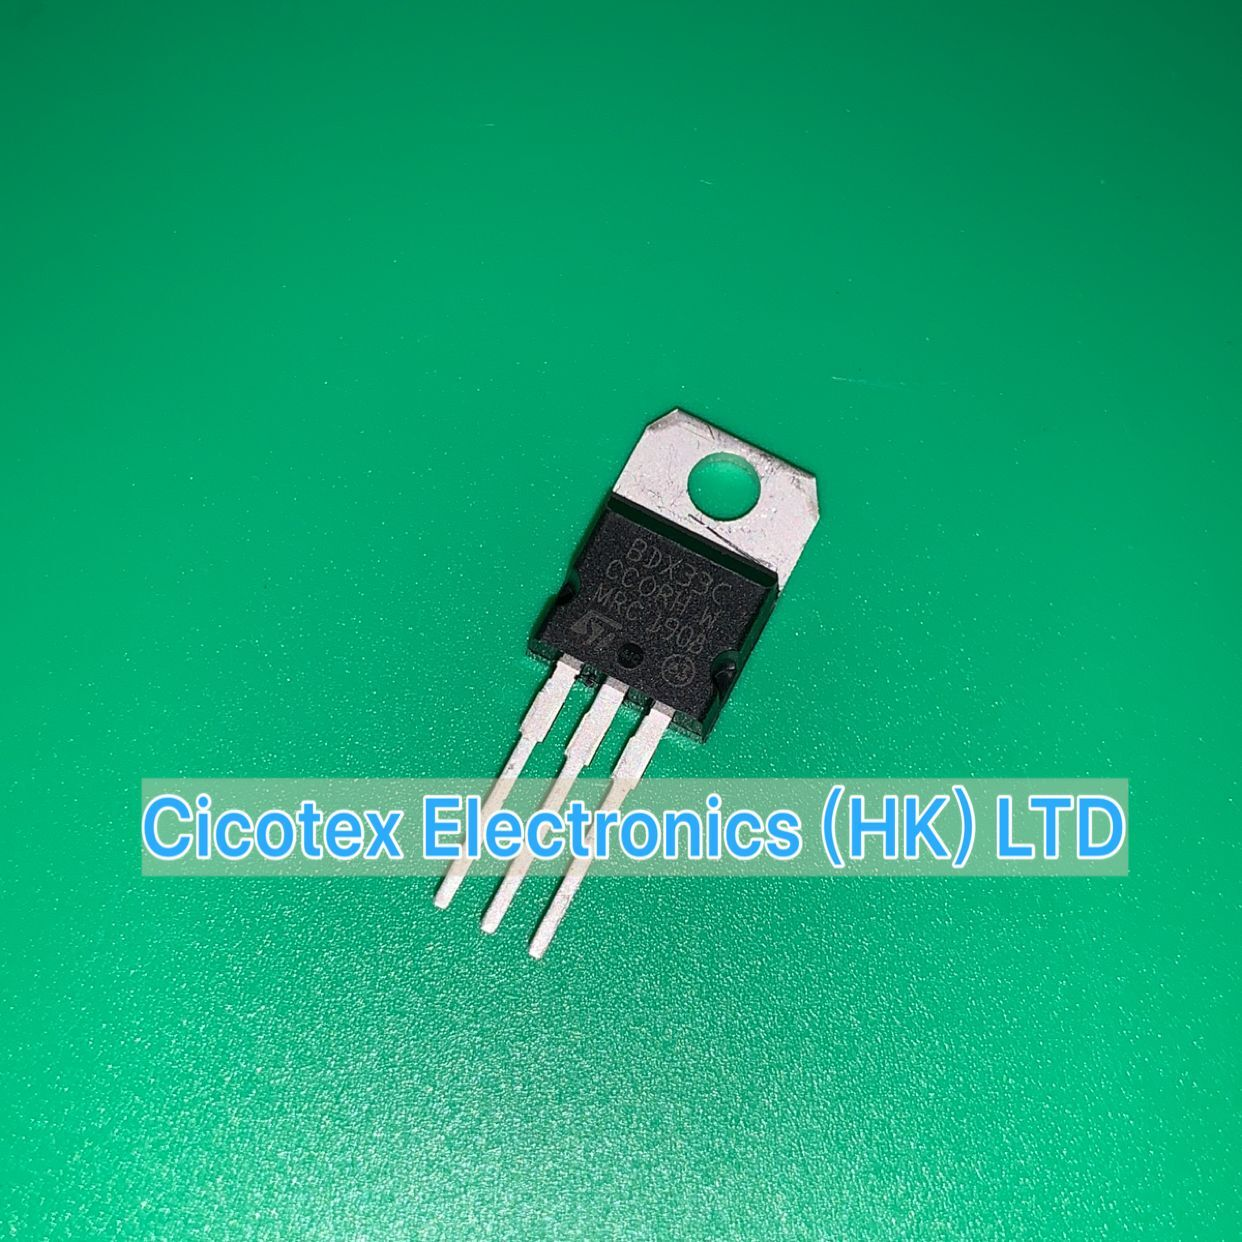 10pcs/lot BDX33C TO-220 BDX-33C TRANS NPN DARL 100V 10A 70W TO220AB BDX33CTU BDX33CG BDX33C-S